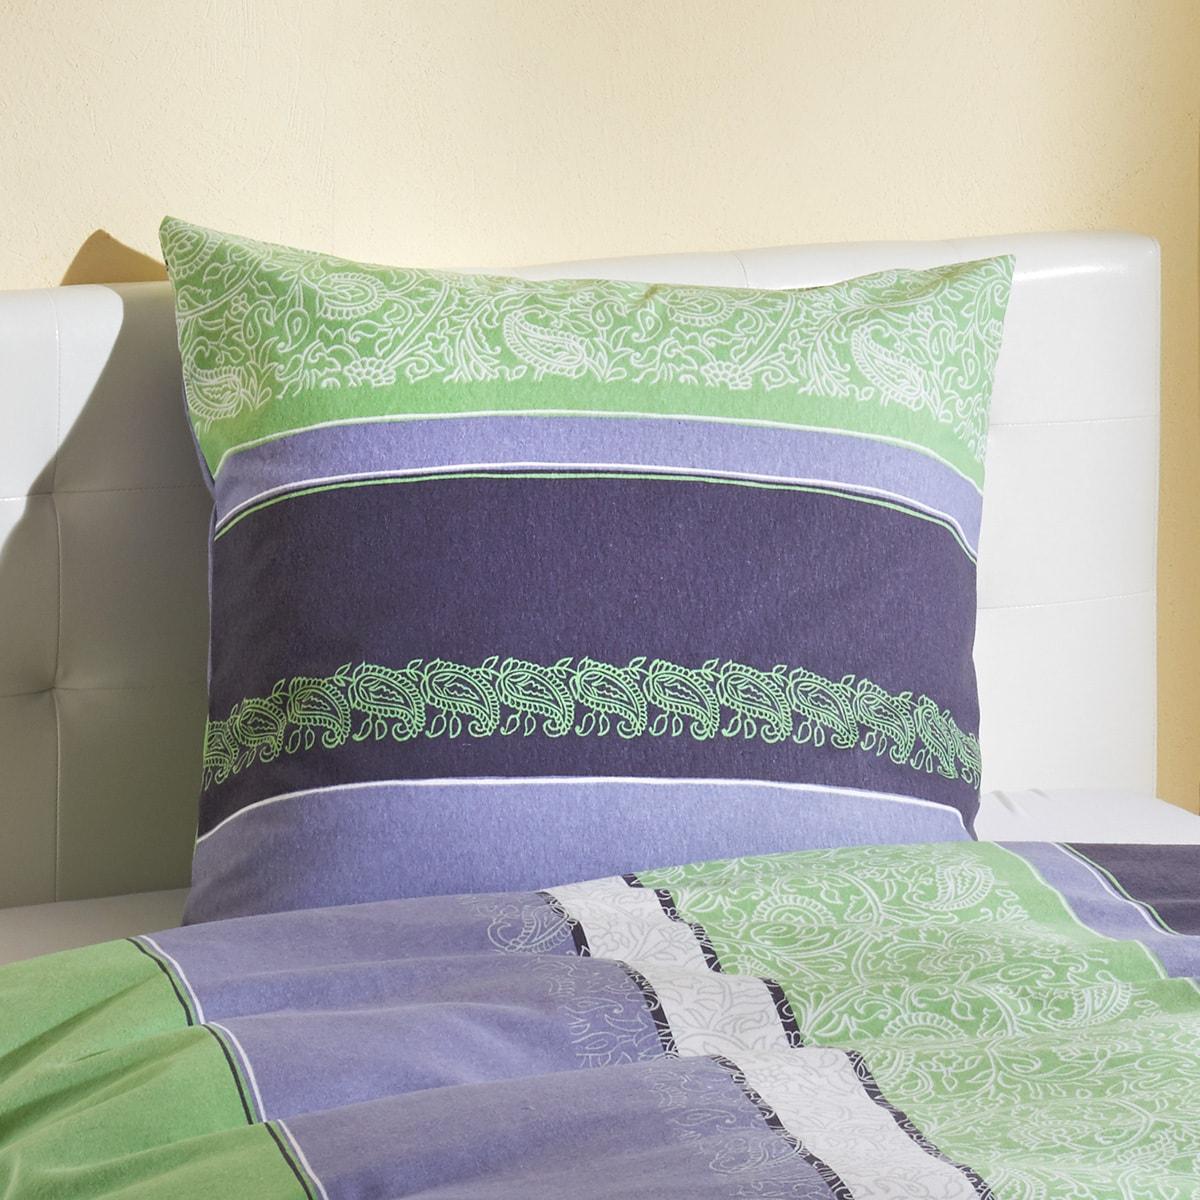 traumschlaf feinbiber bettw sche paisley gr n g nstig. Black Bedroom Furniture Sets. Home Design Ideas